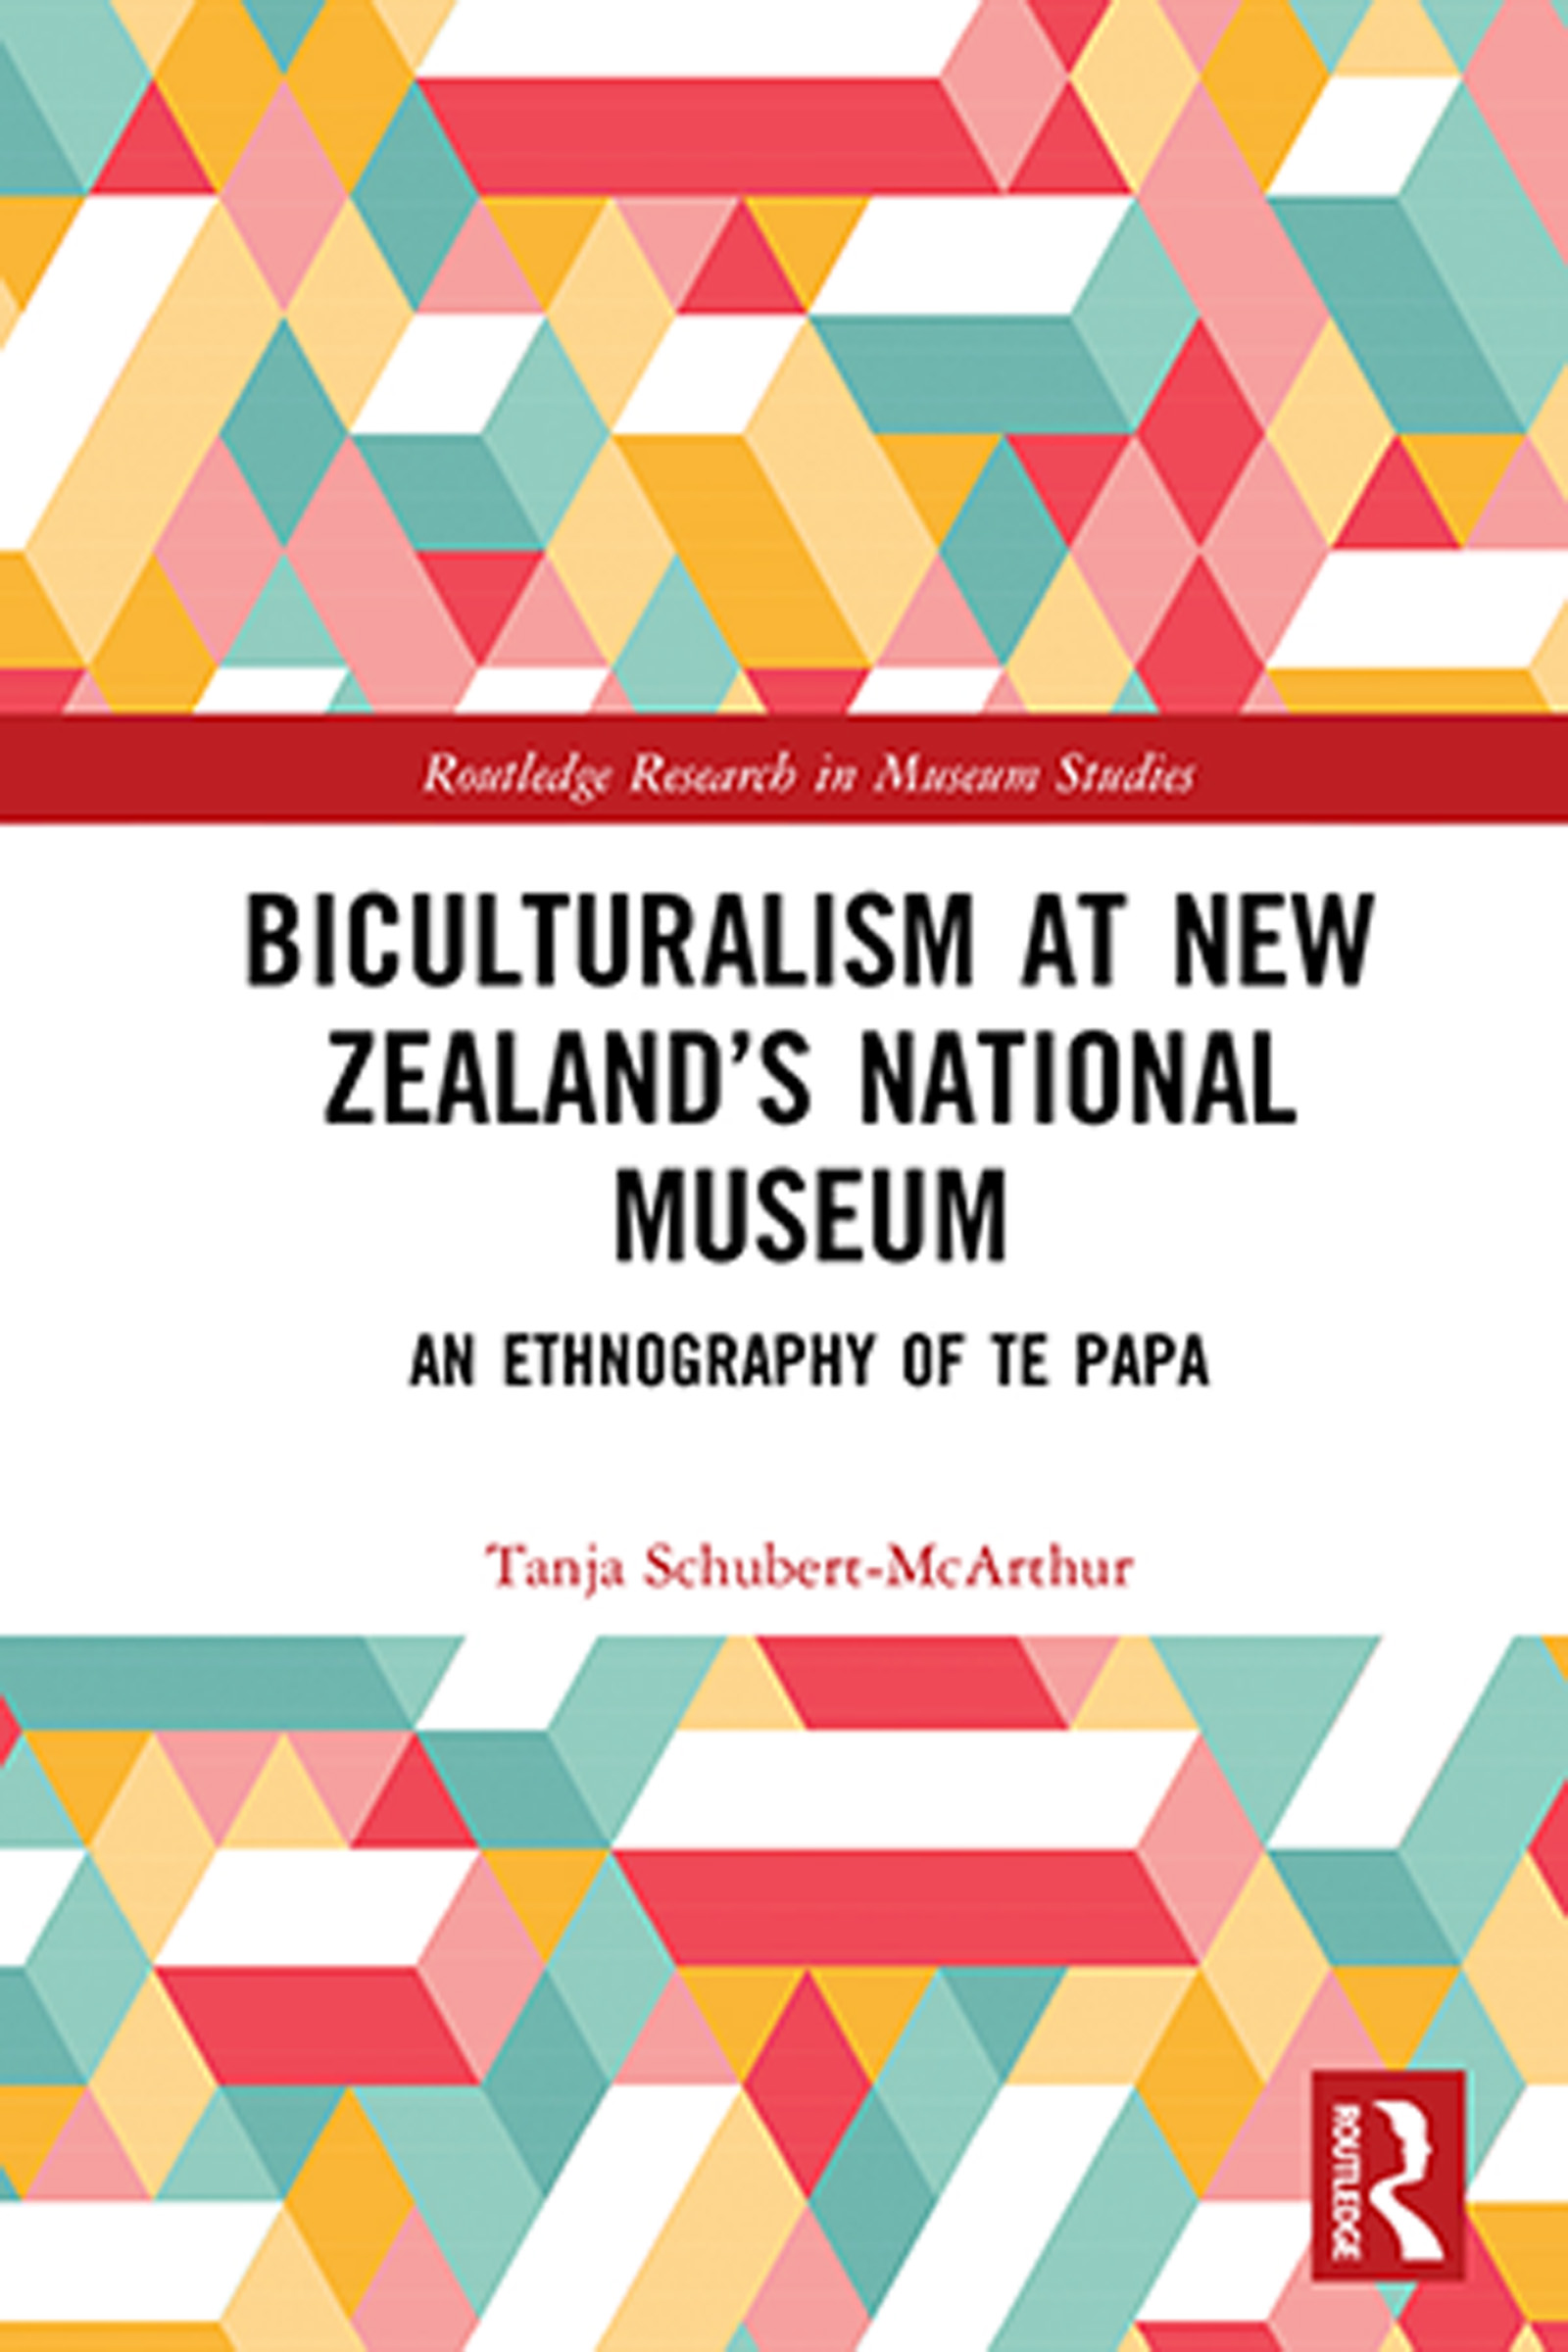 Biculturalism at New Zealand's National Museum